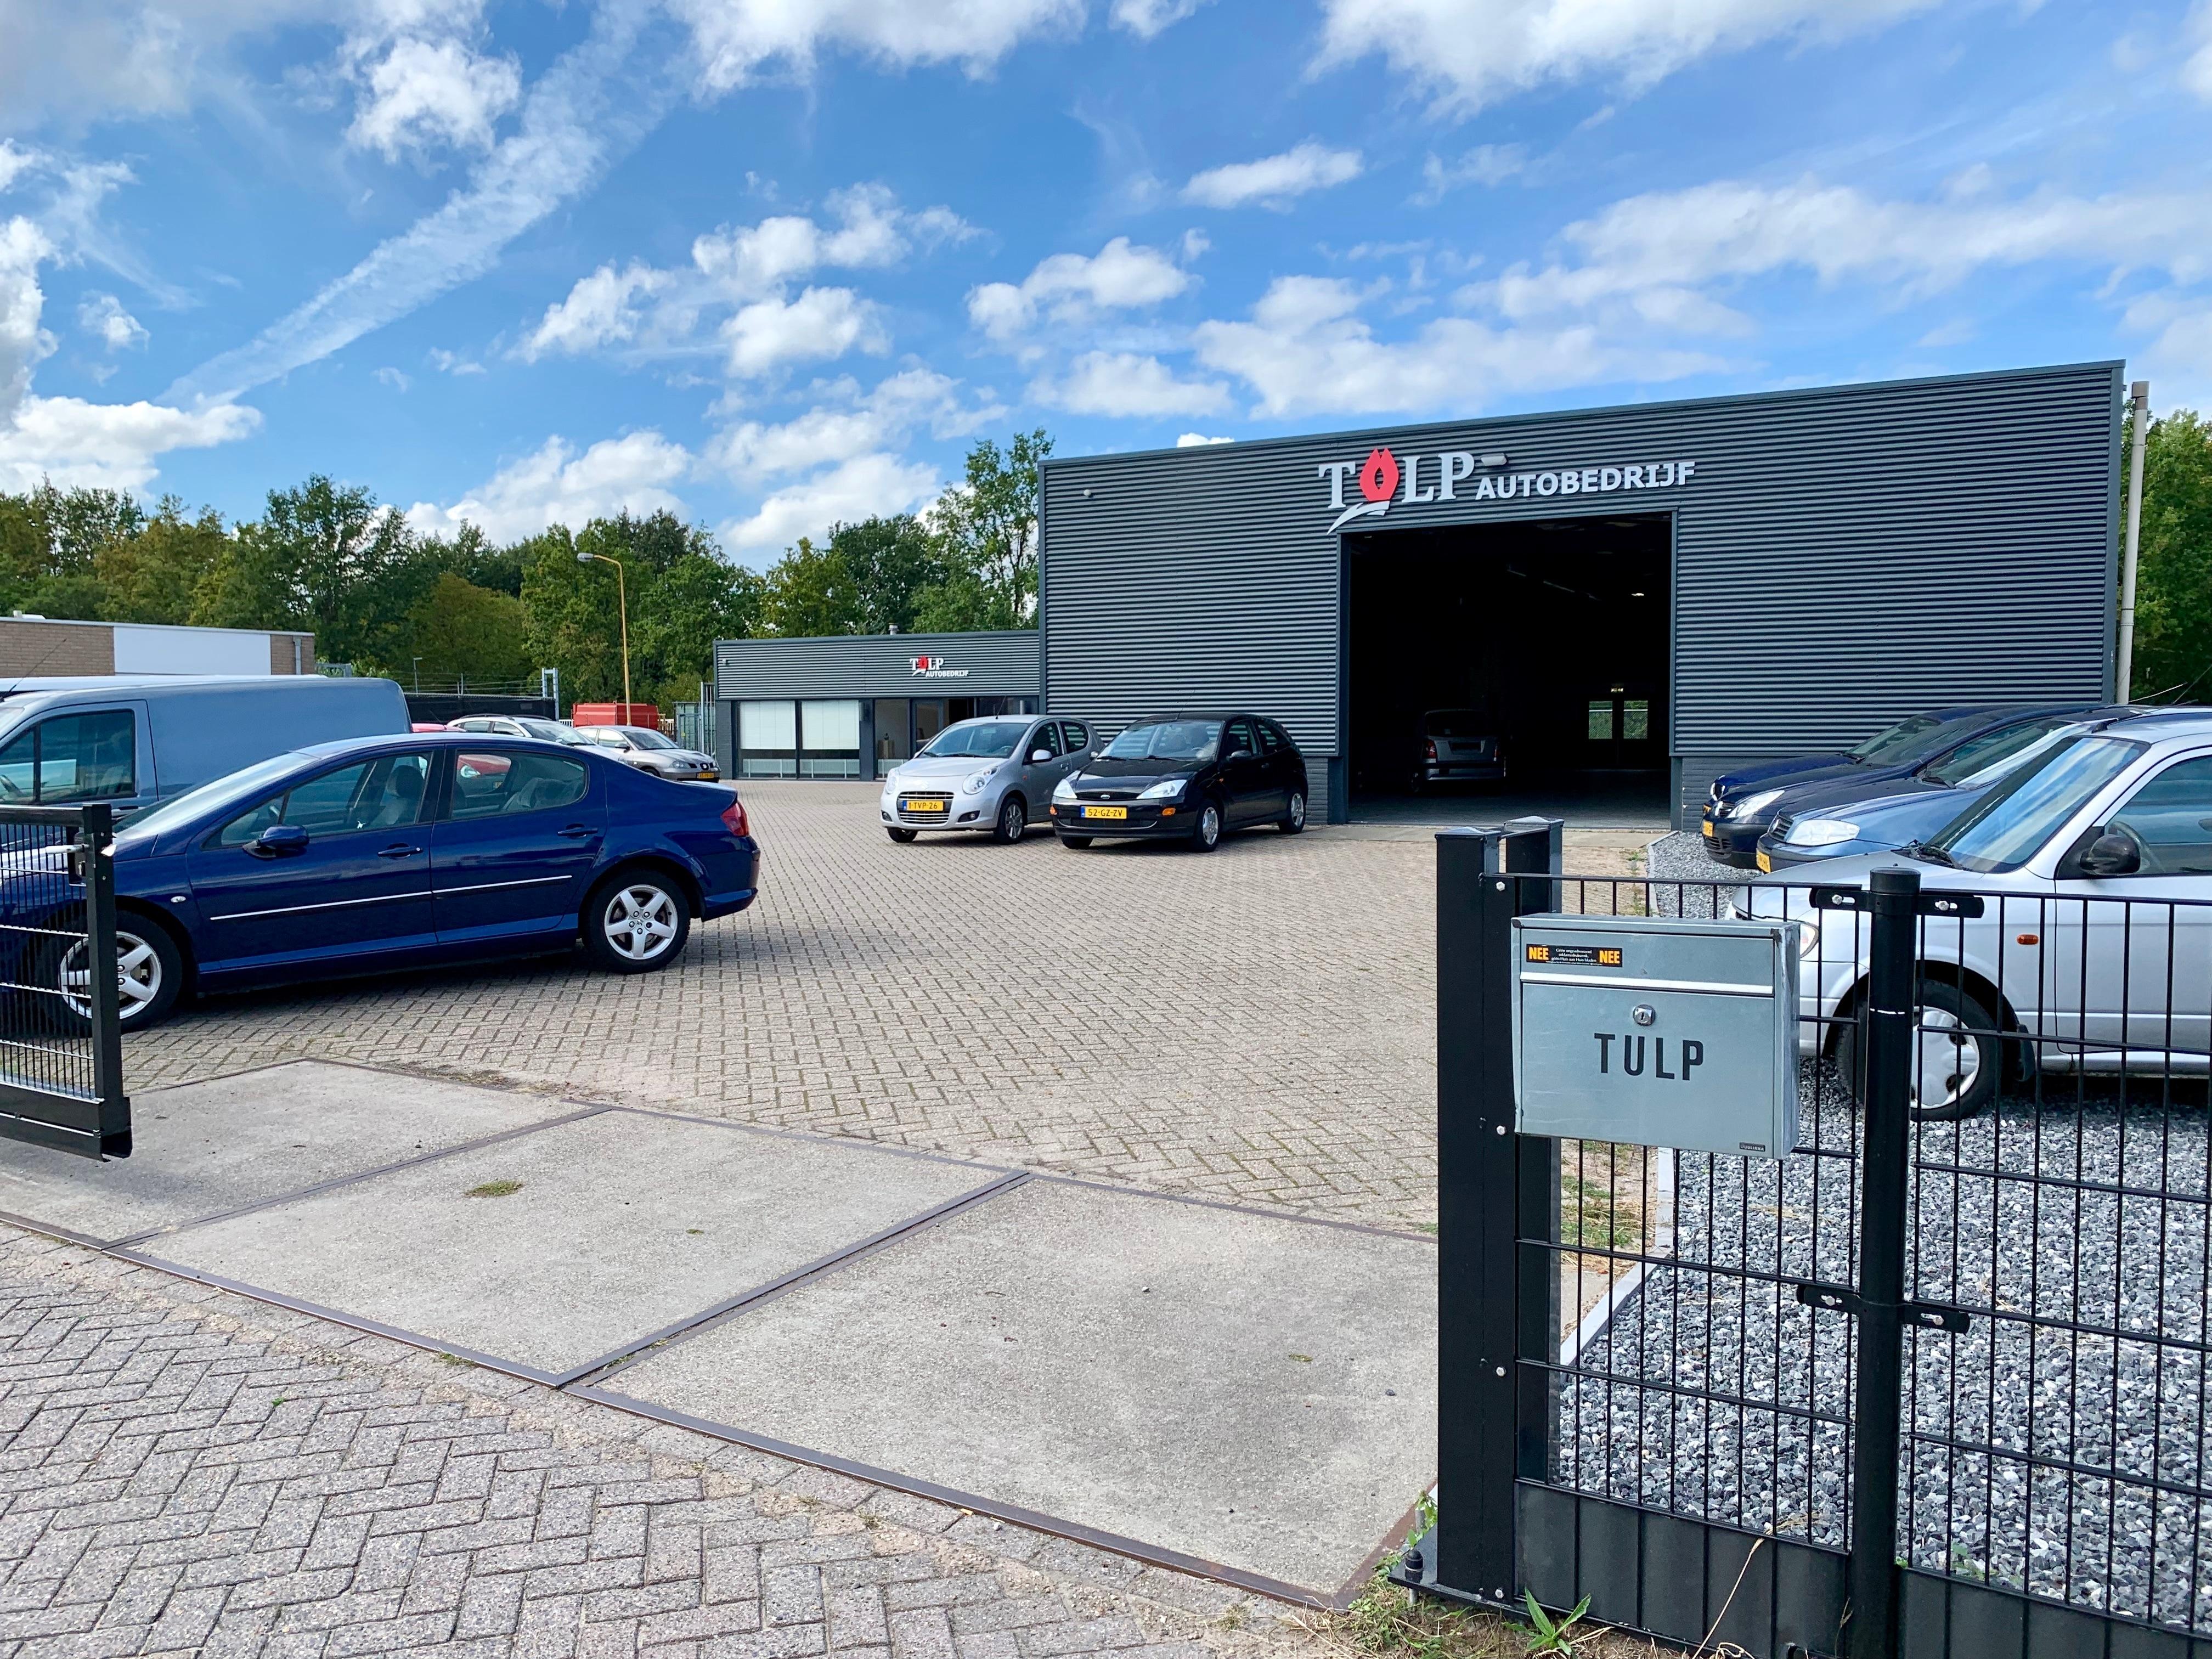 Tulp Autobedrijf Breda